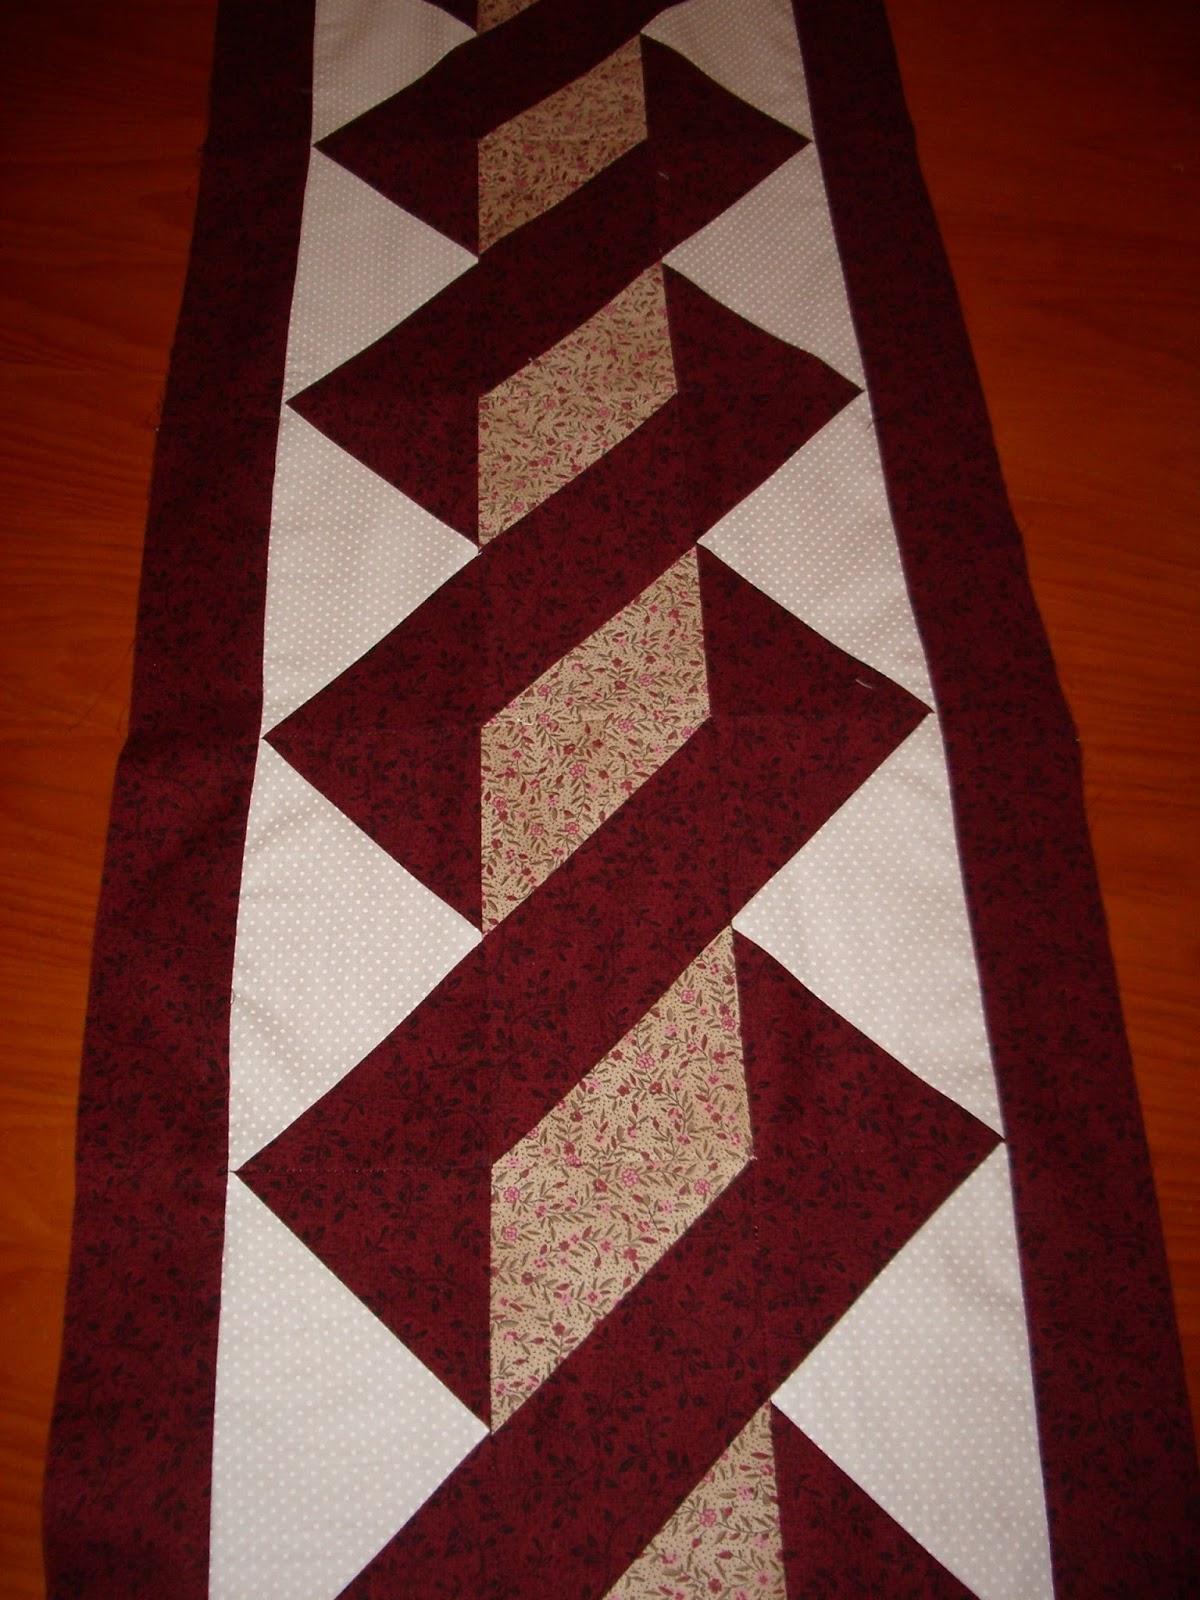 El costurero de chus camino de mesa - Camino mesa patchwork ...